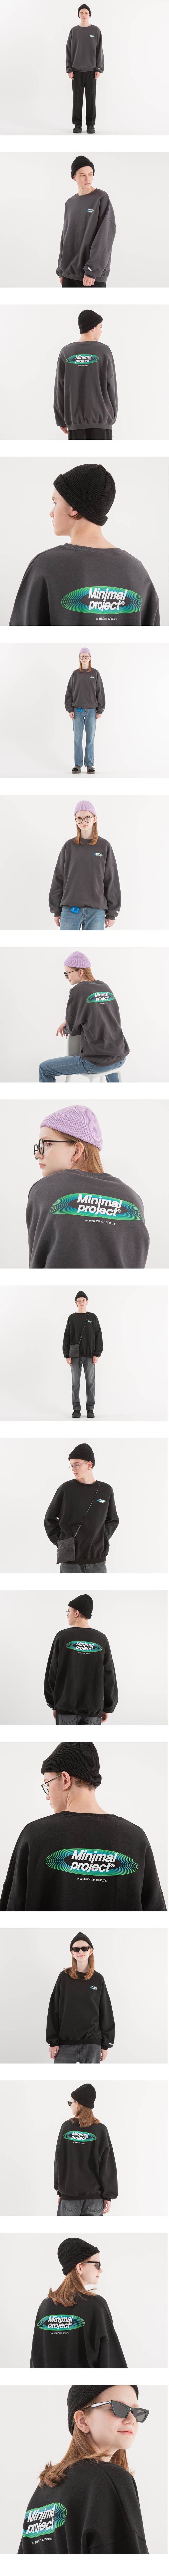 [minimal project] 미니멀프로젝트 오벌 그라데이션 오버핏 맨투맨 MMT105 / 2color